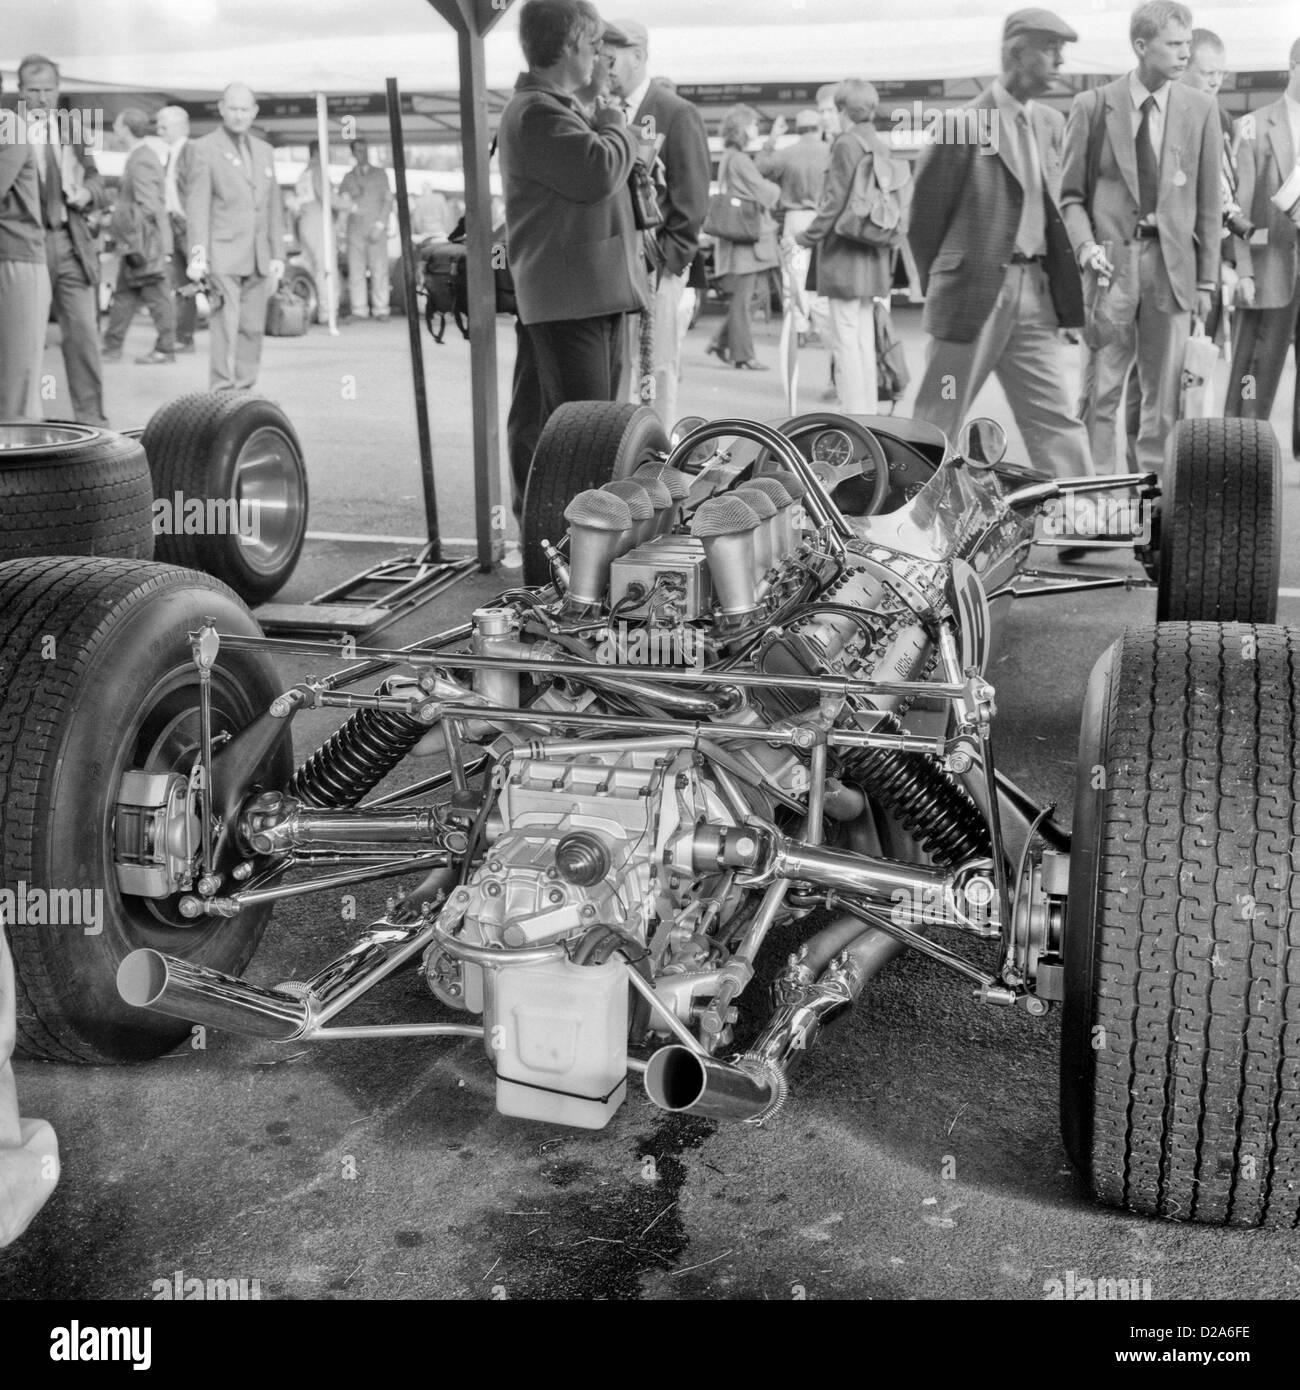 1967 Lotus 49  in the paddock at Goodwood  motor racing circuit, West Sussex. UK September 1999 - Stock Image